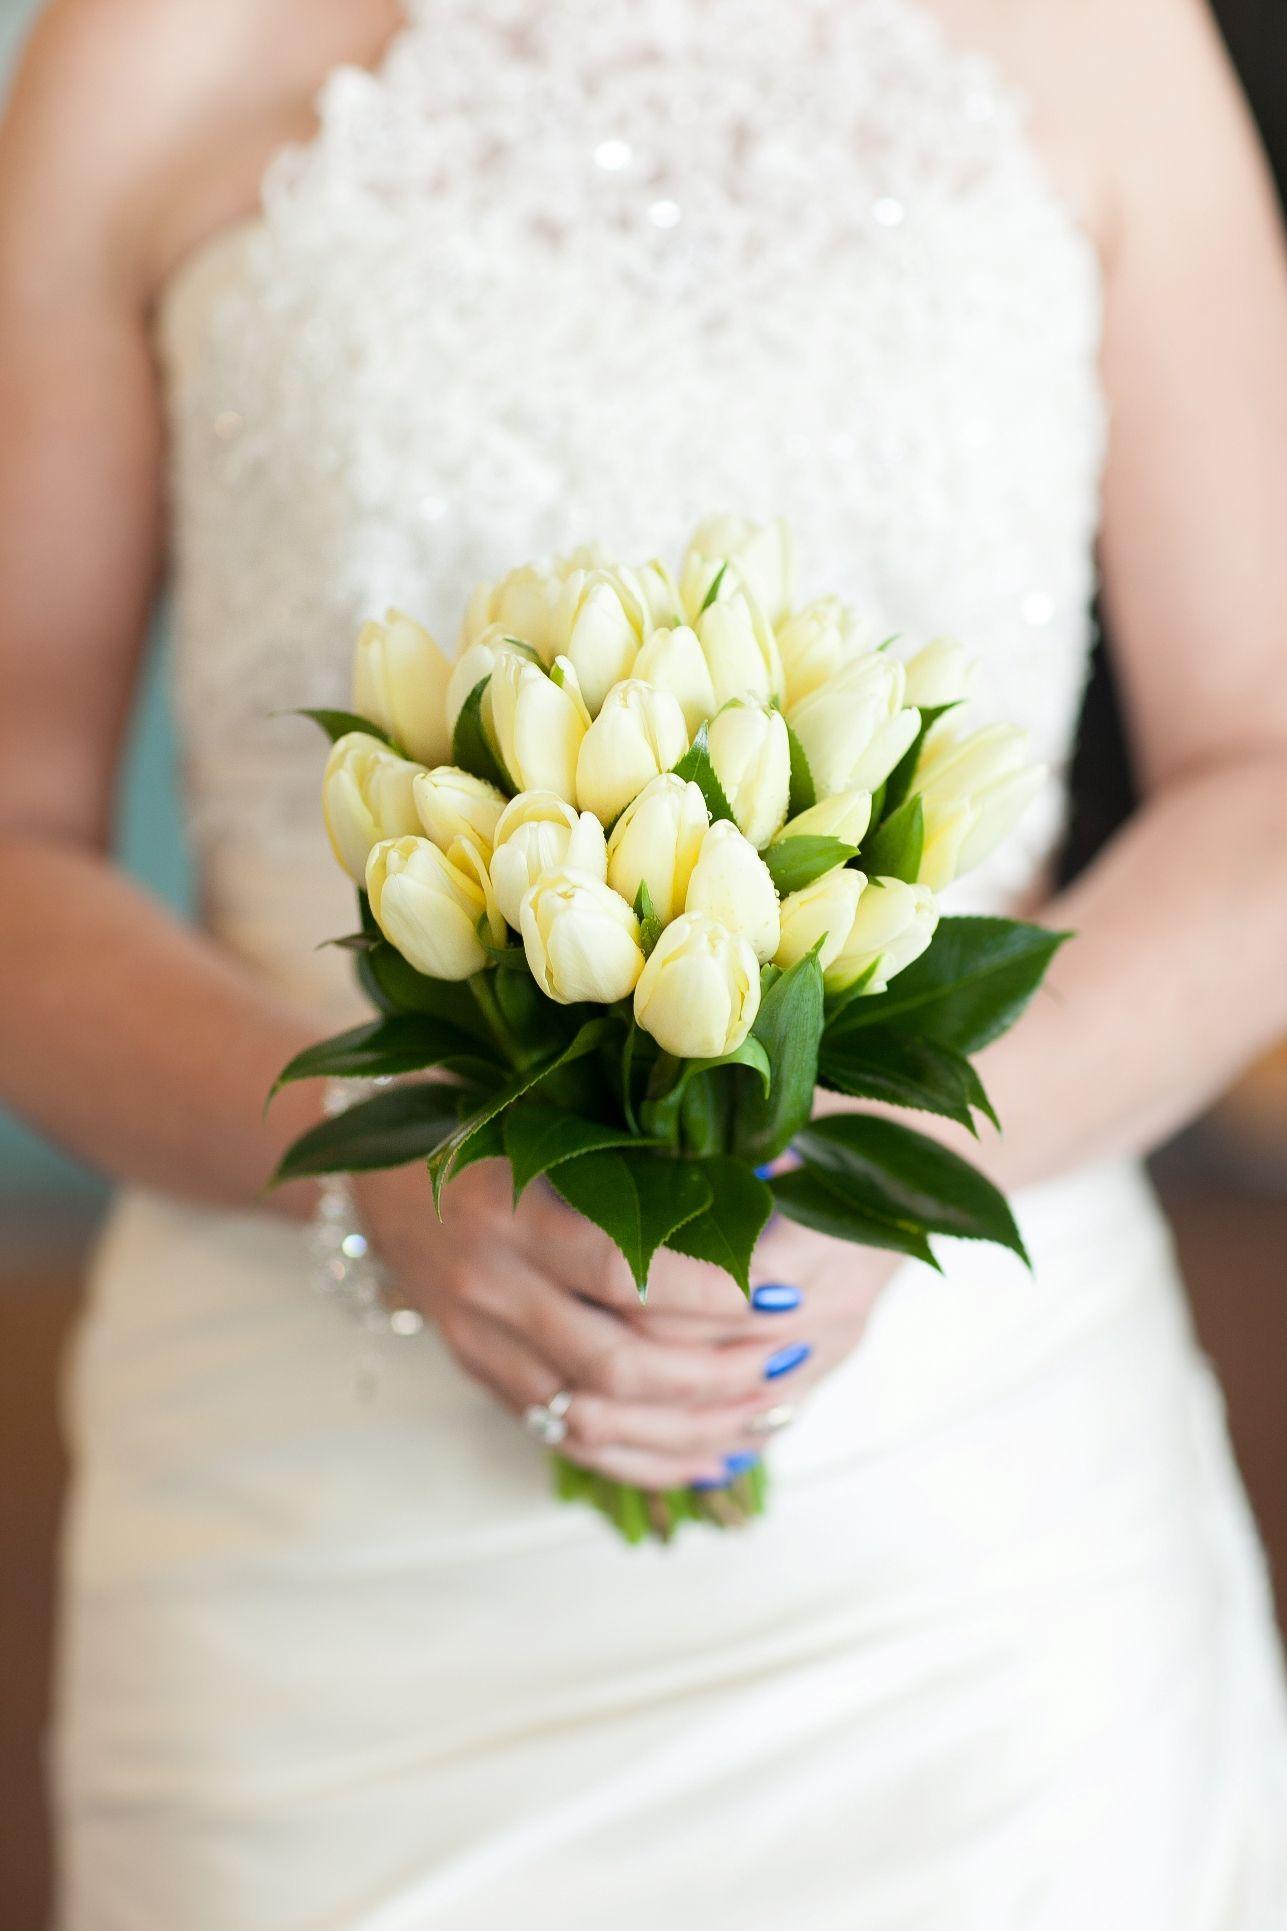 Wedding Bride Flowers Bouquet